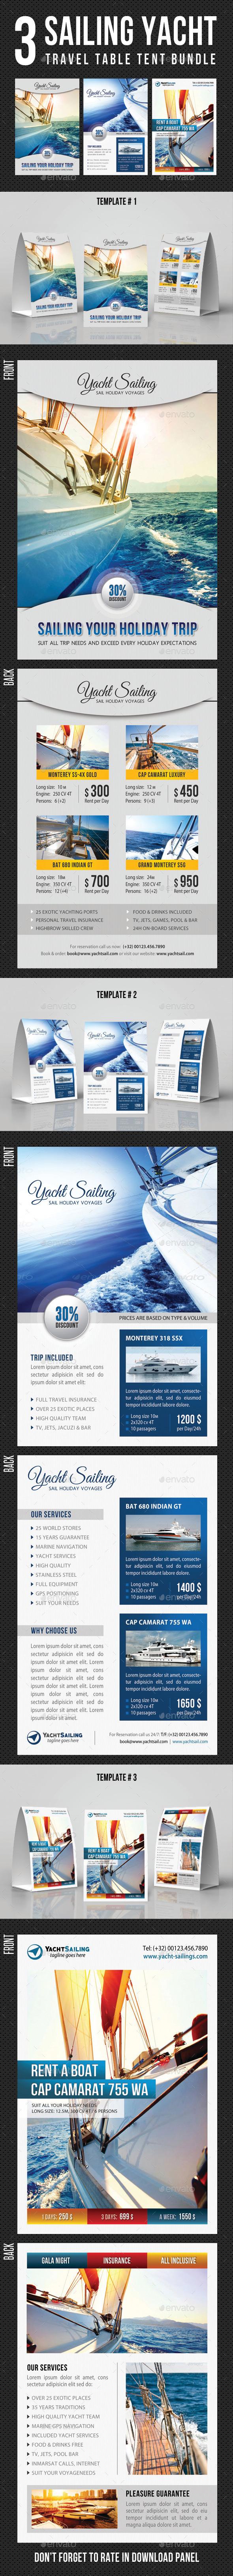 3 Sailing Yacht Travel Table Tent Bundle - Miscellaneous Print Templates